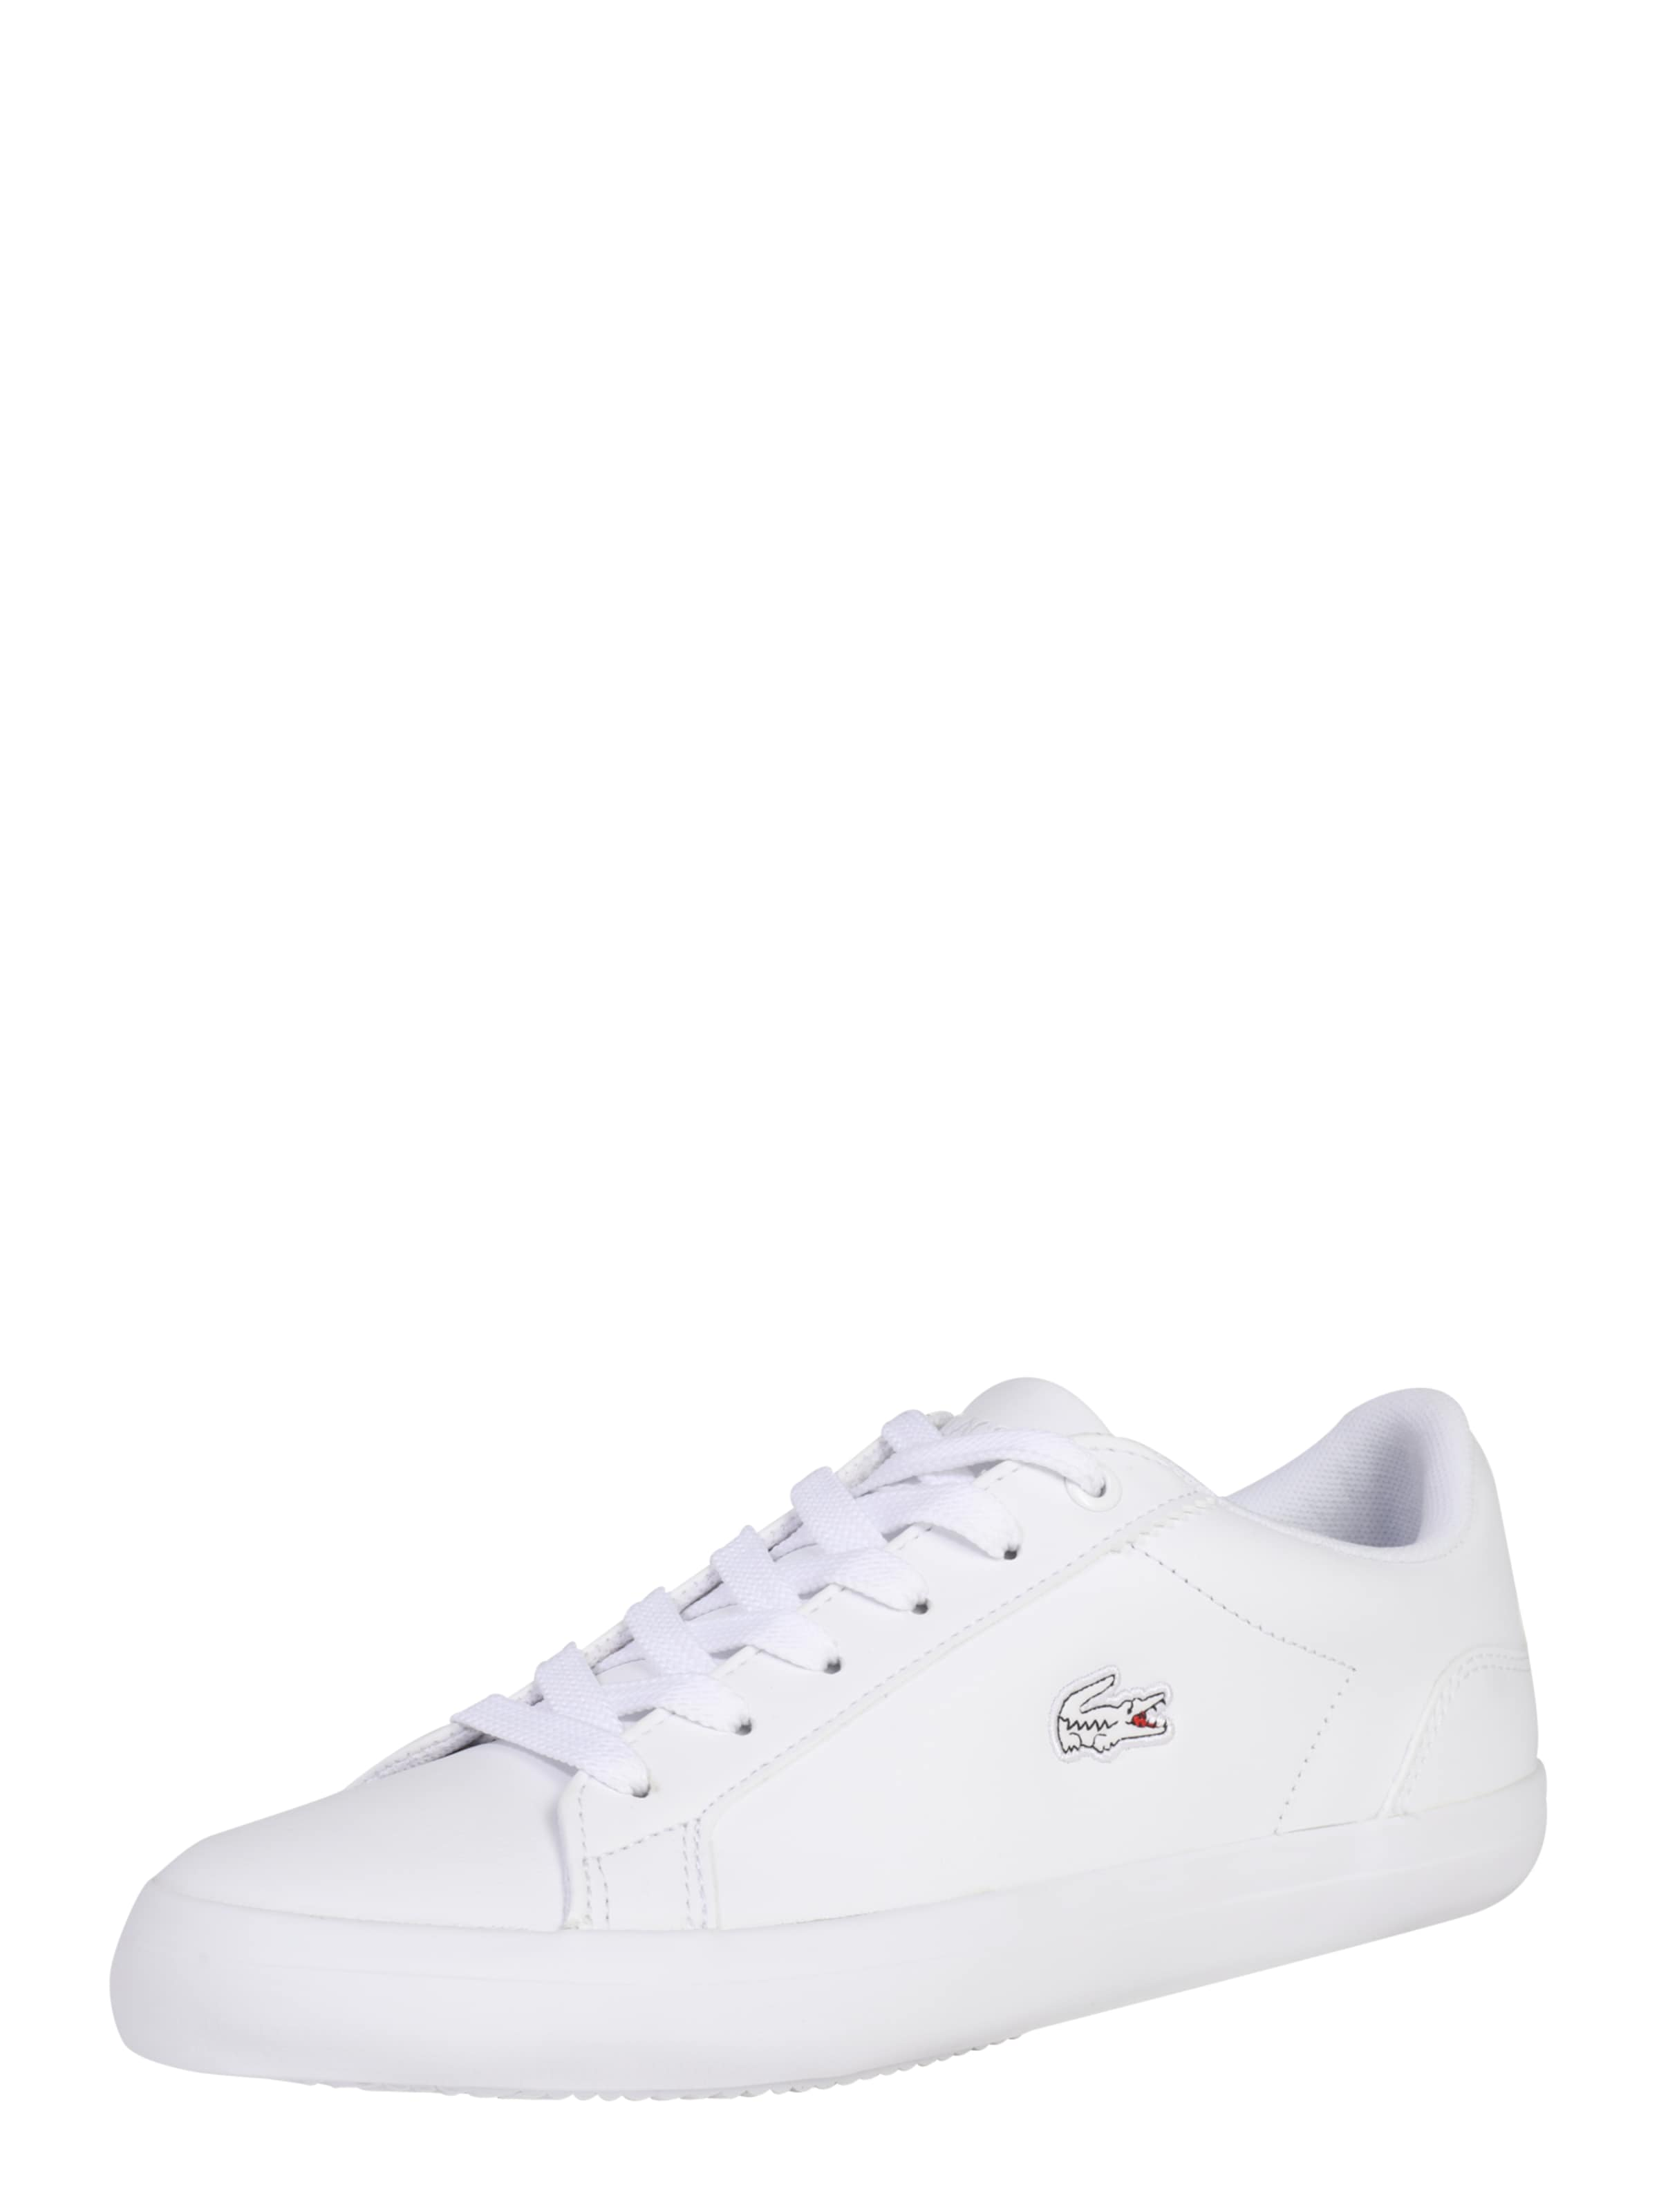 'lerond' 'lerond' Lacoste In In Weiß 'lerond' Weiß Sneaker Sneaker Sneaker Lacoste Lacoste PiZOkXu